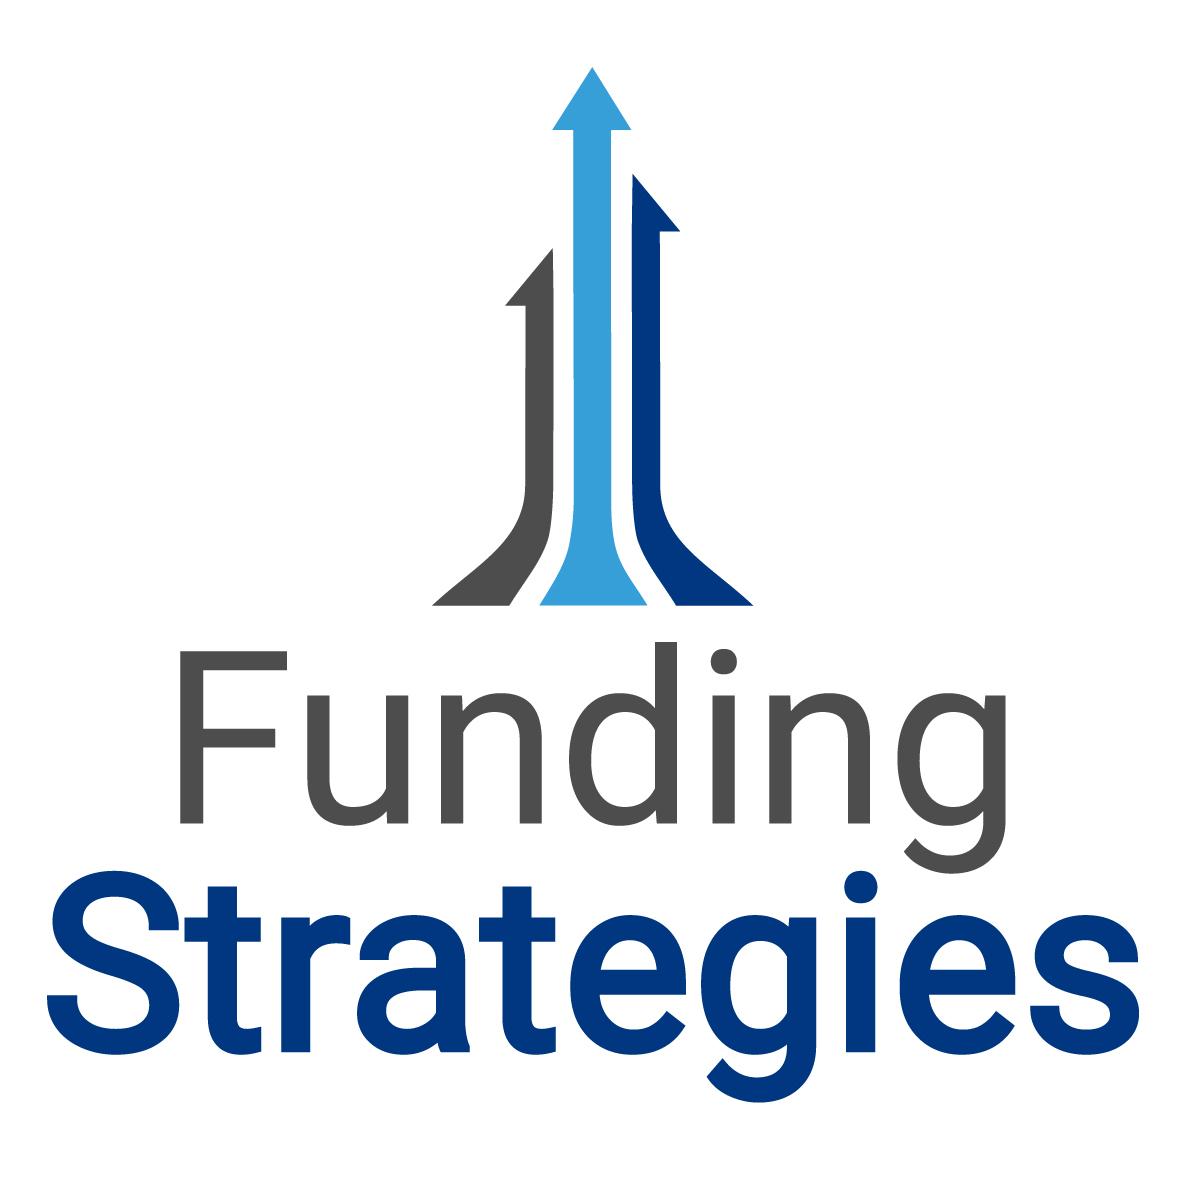 Funding Strategies logo